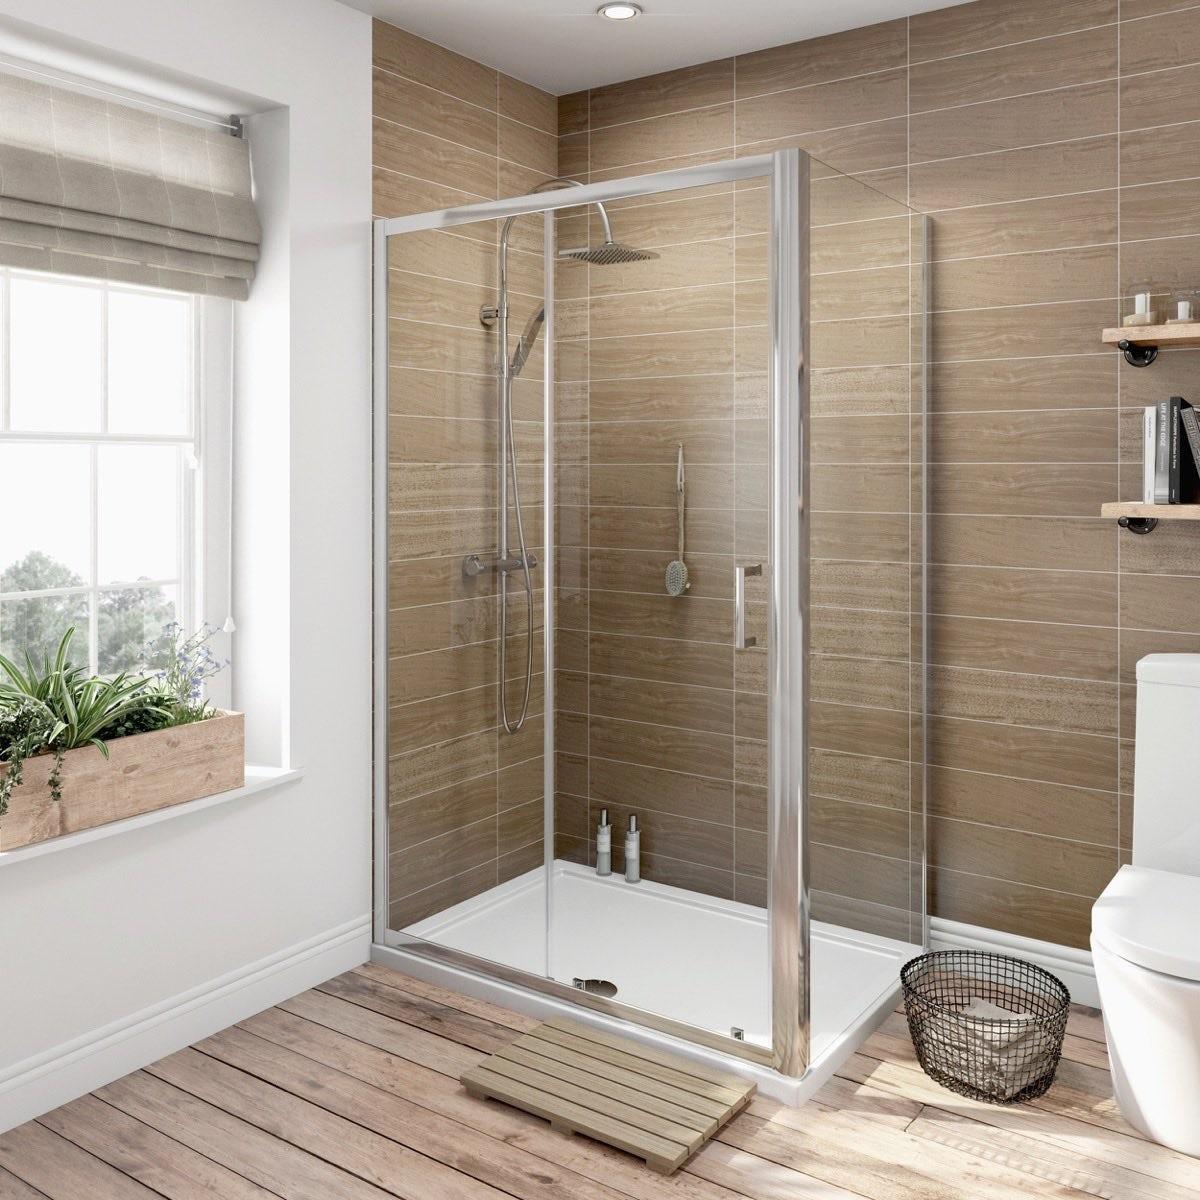 Orchard 6mm sliding door shower enclosure 1000 x 700